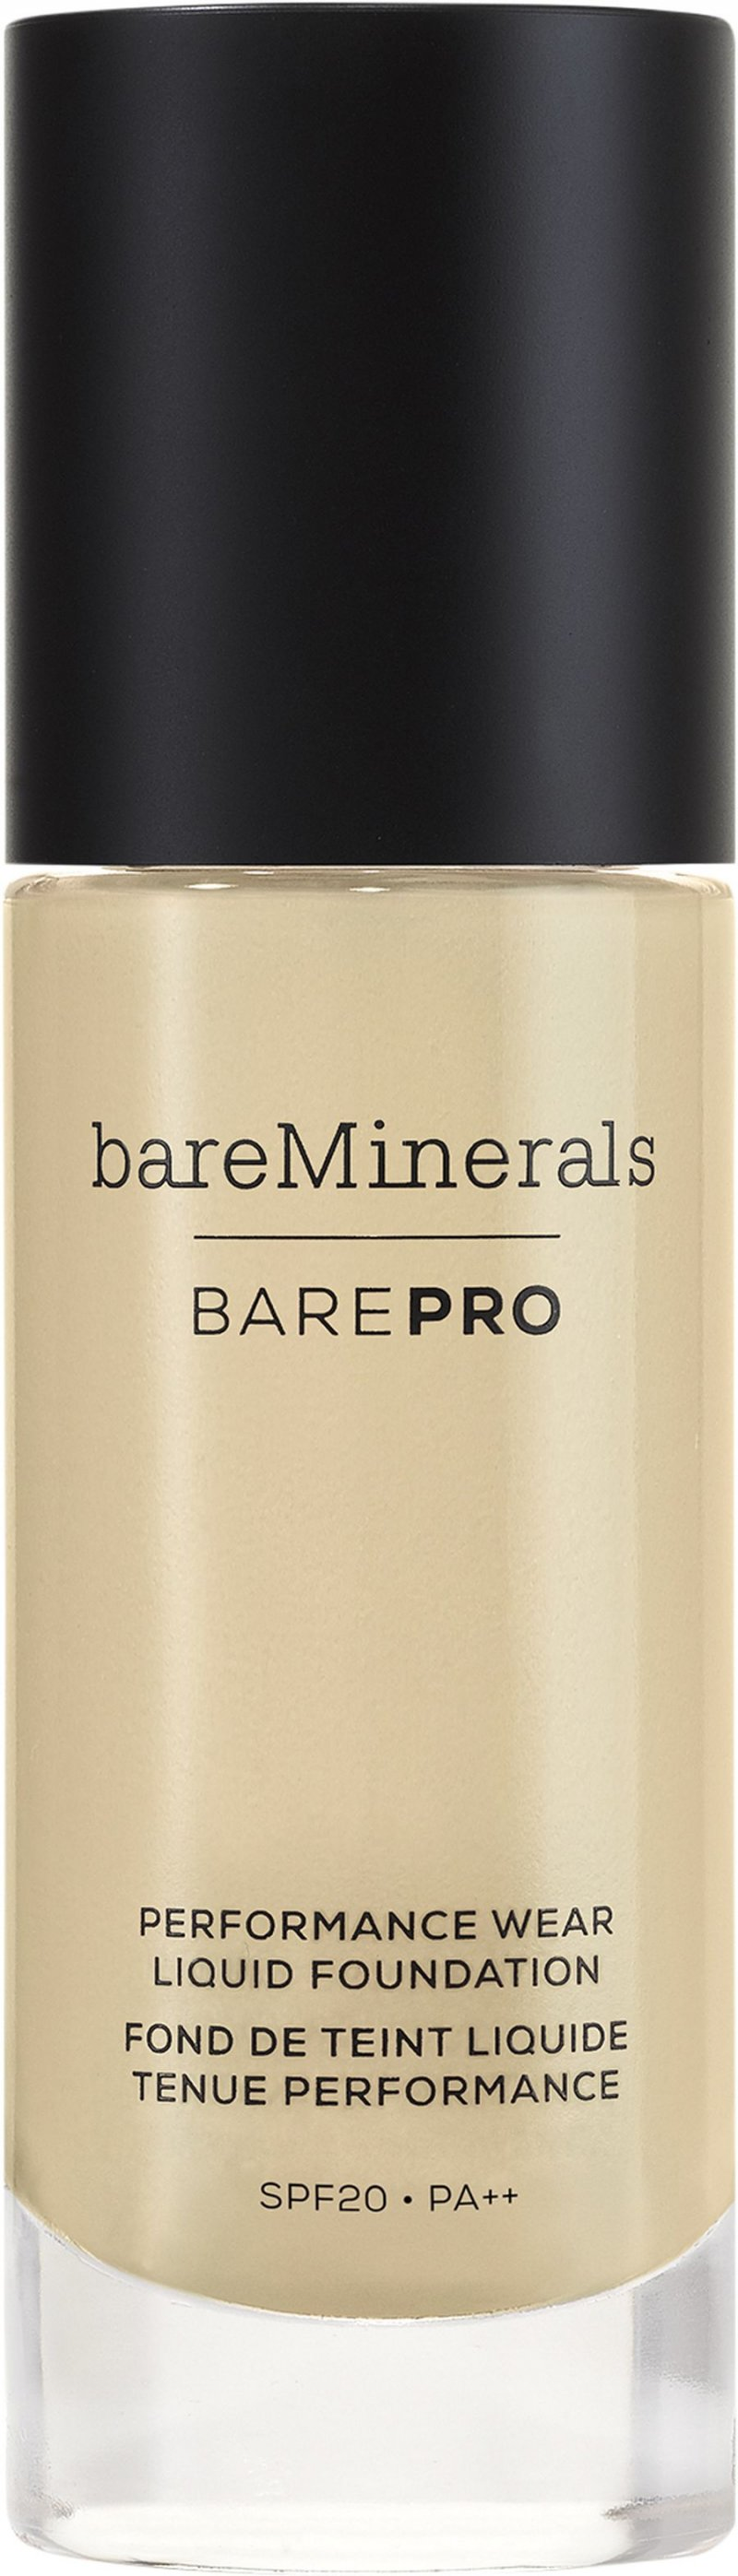 Image of   Bareminerals Foundation - Barepro Performance Wear Liquid - Sateen 05